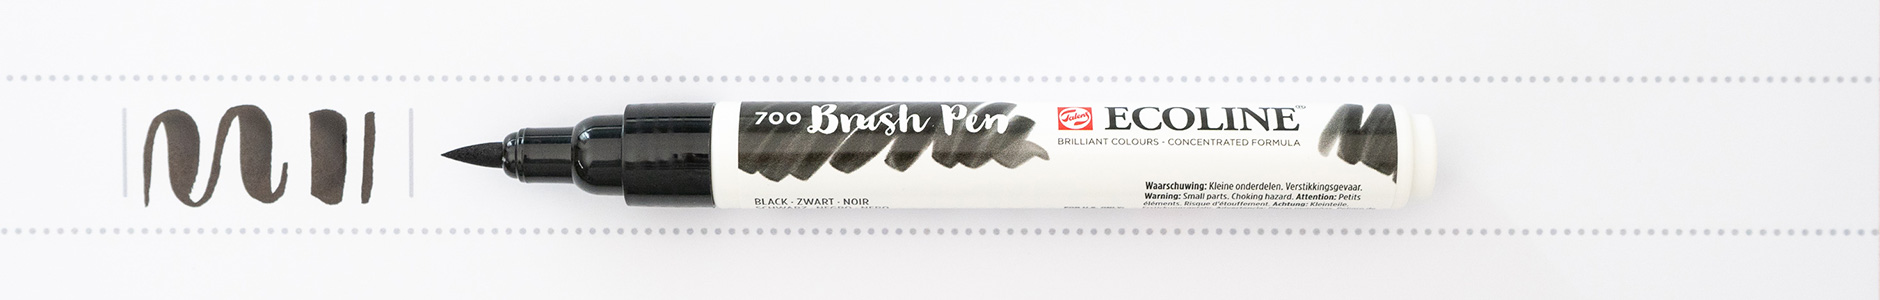 ECOLINE 700 Brush Pen schwarz